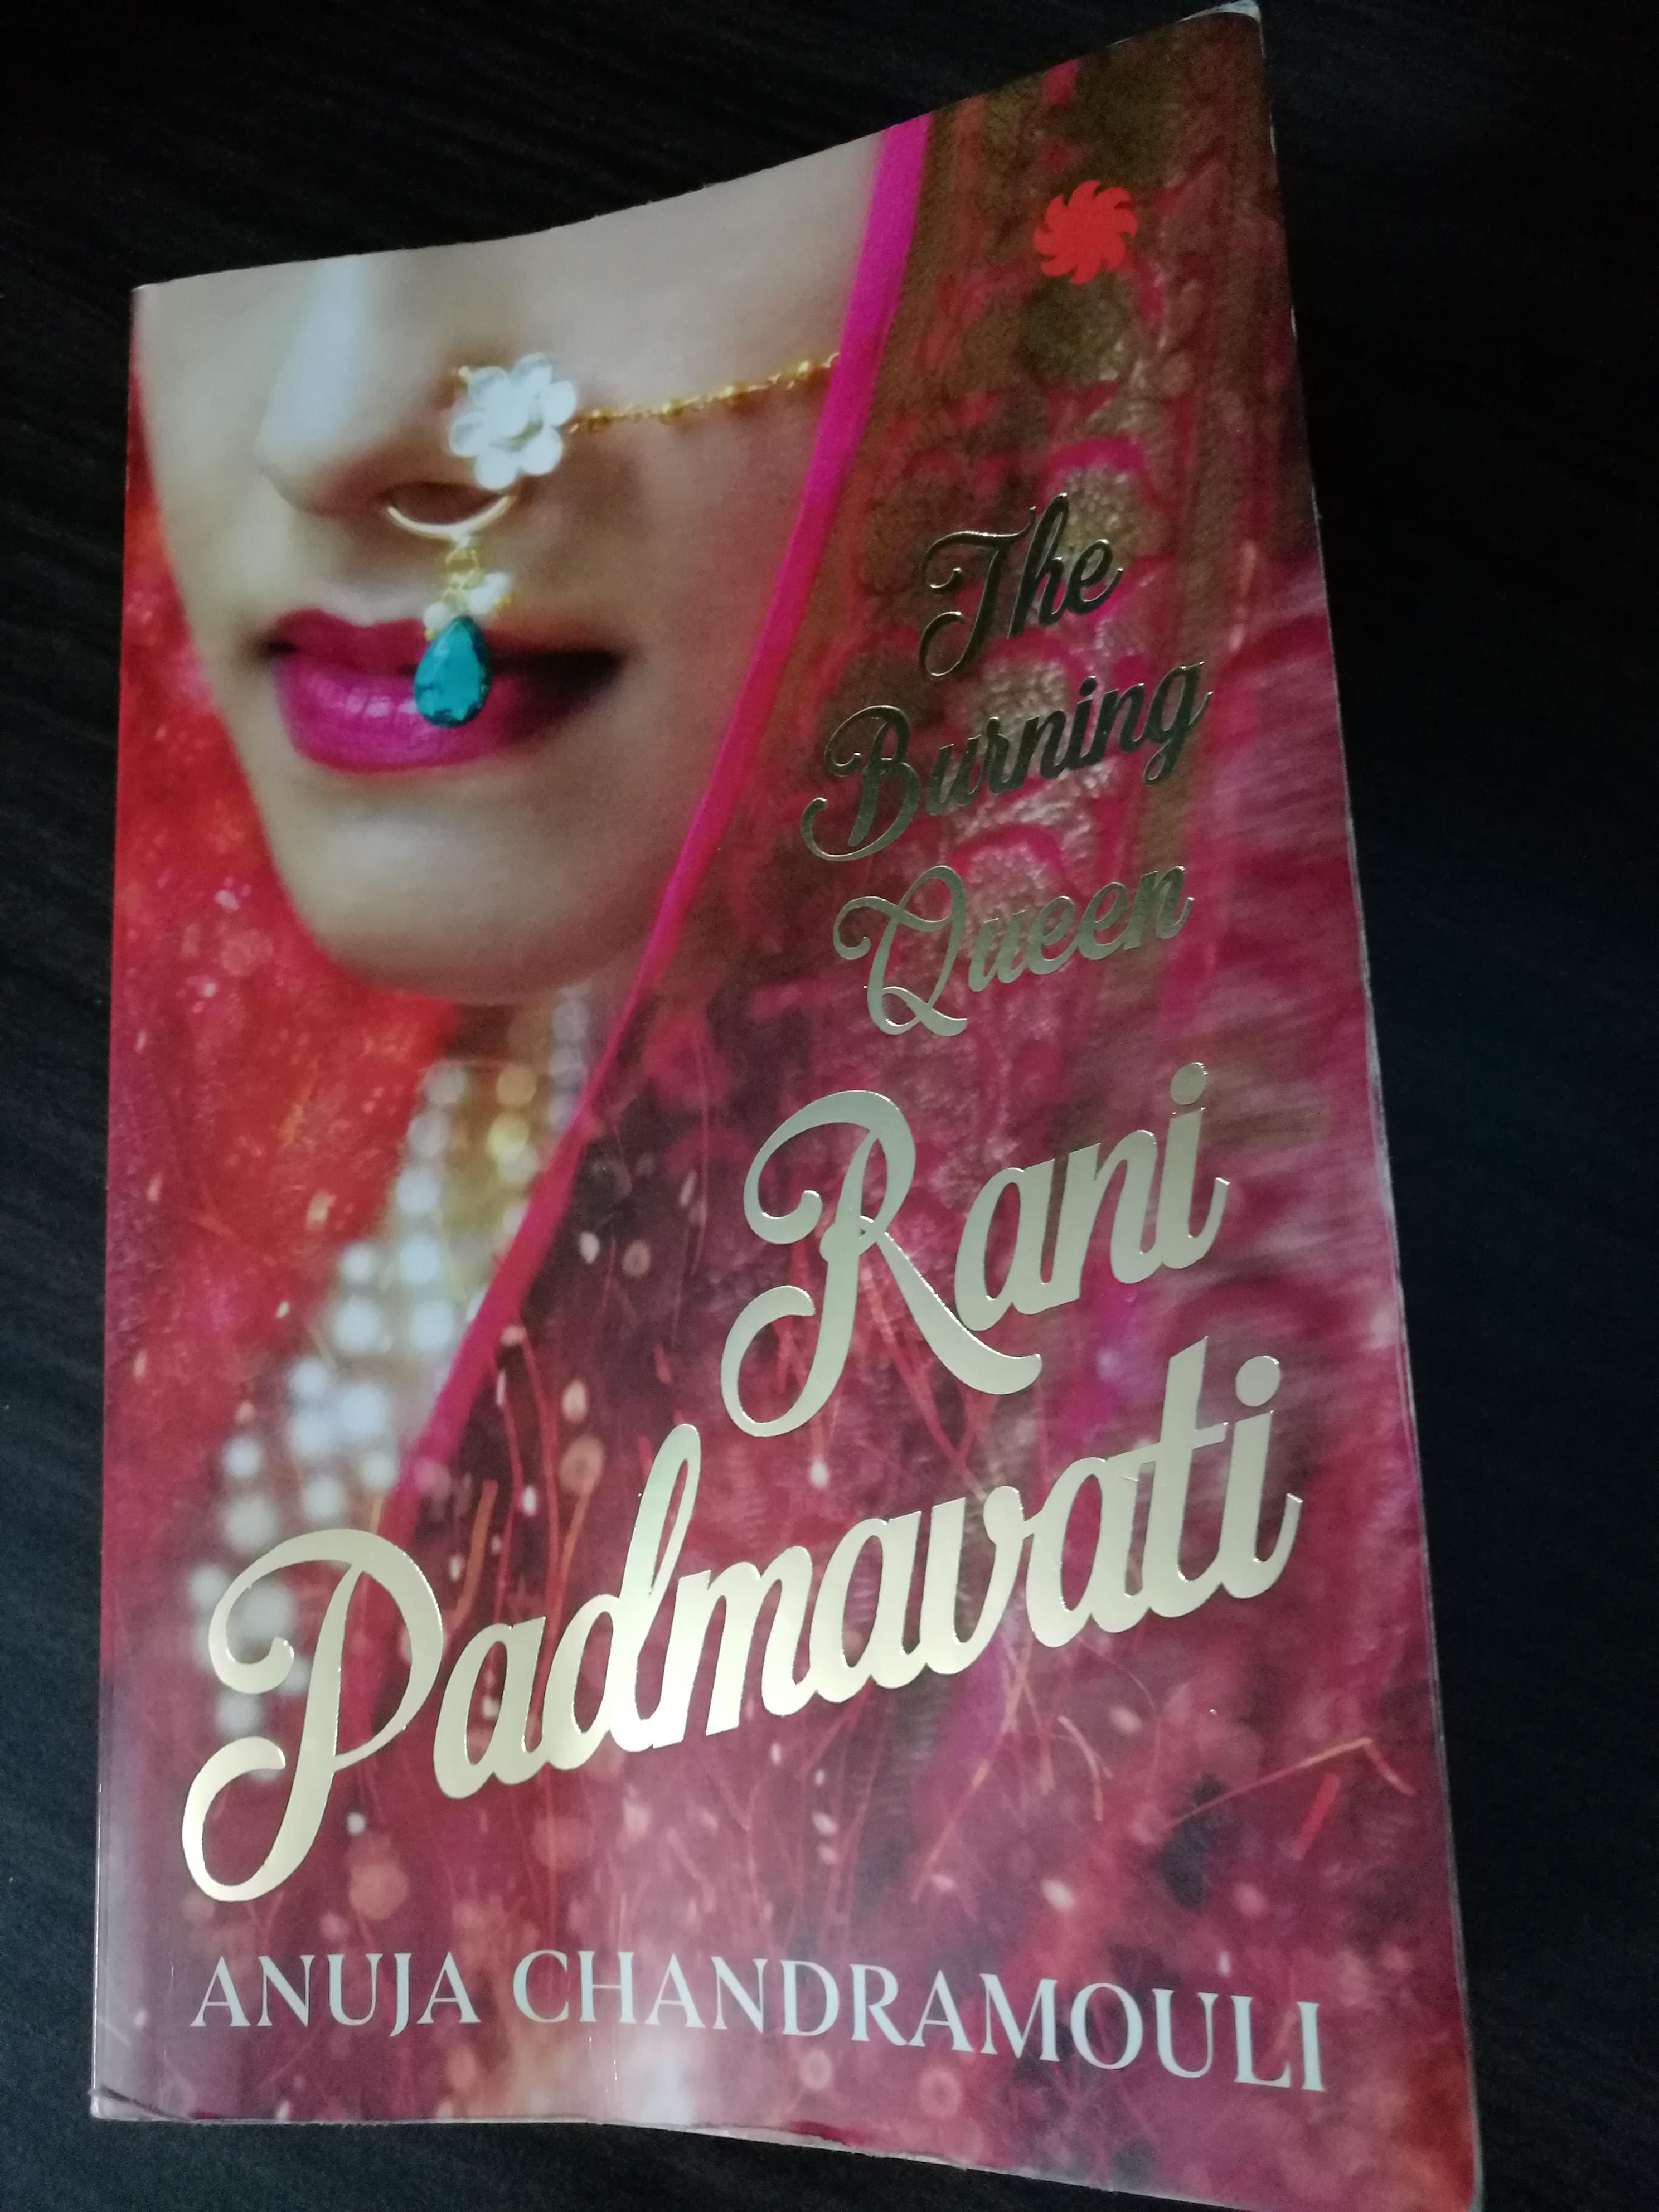 Rani Padmavati